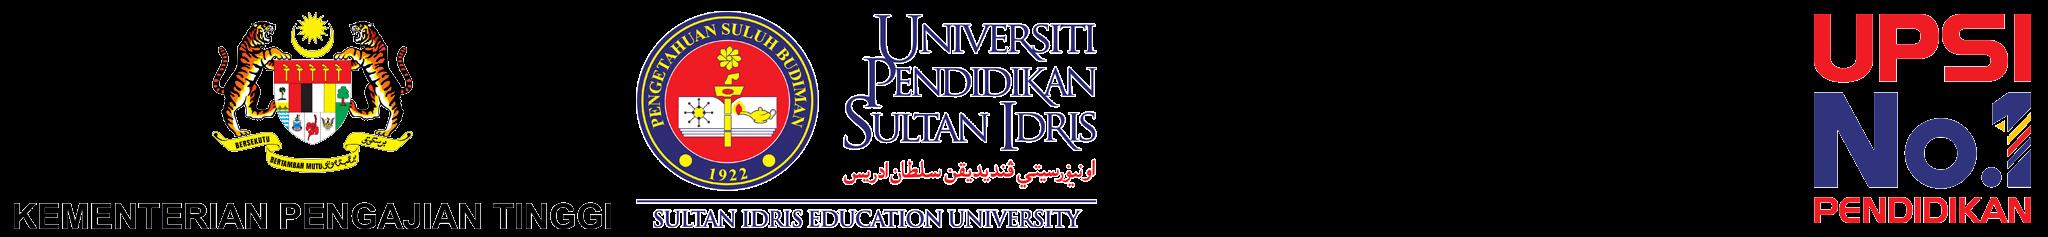 UPSI | Portal Rasmi Universiti Pendidikan Sultan Idris